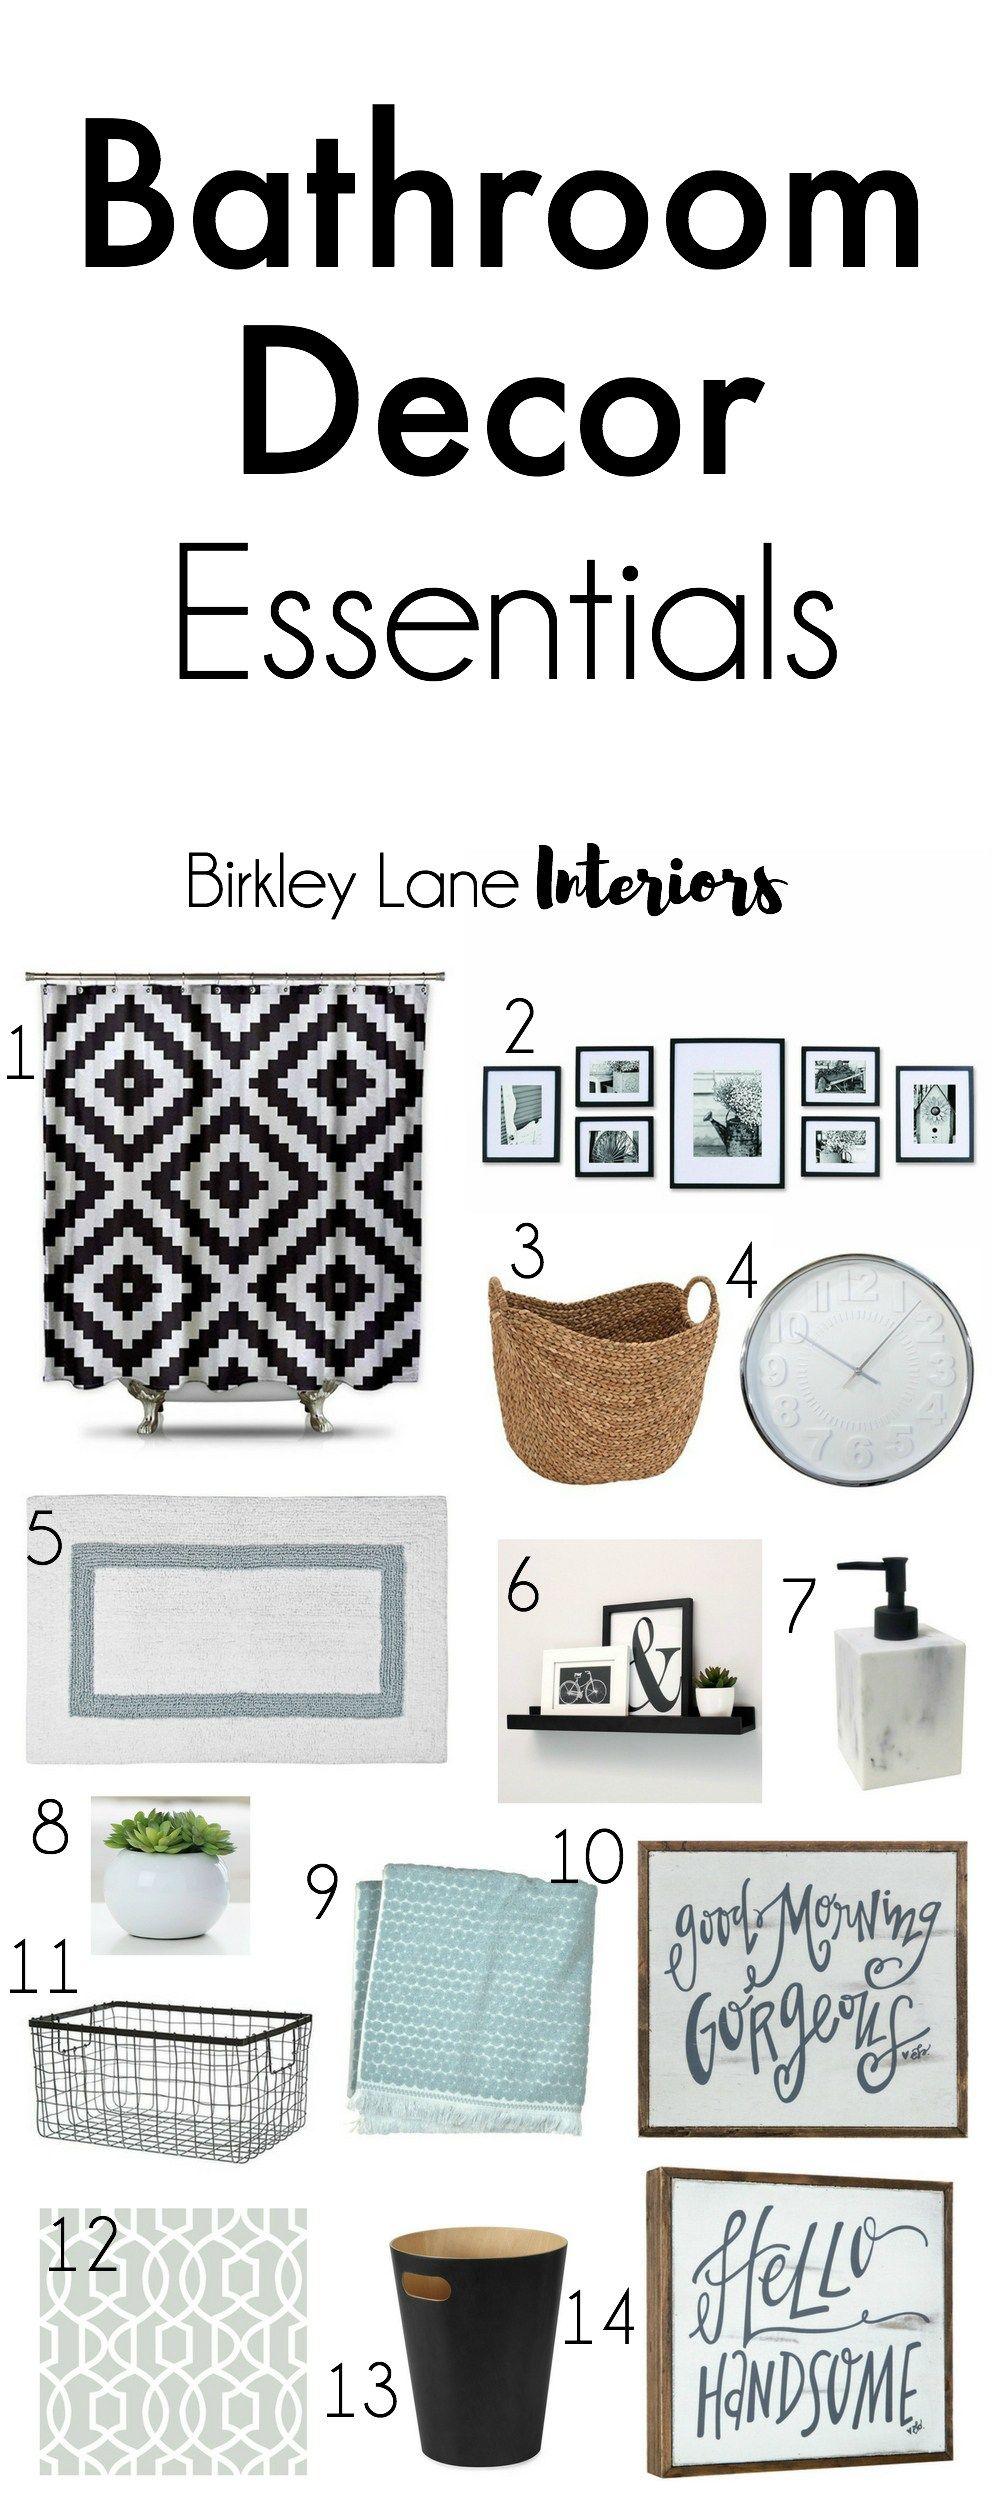 Photo of Bathroom Decor Essentials | Birkley Lane Interiors